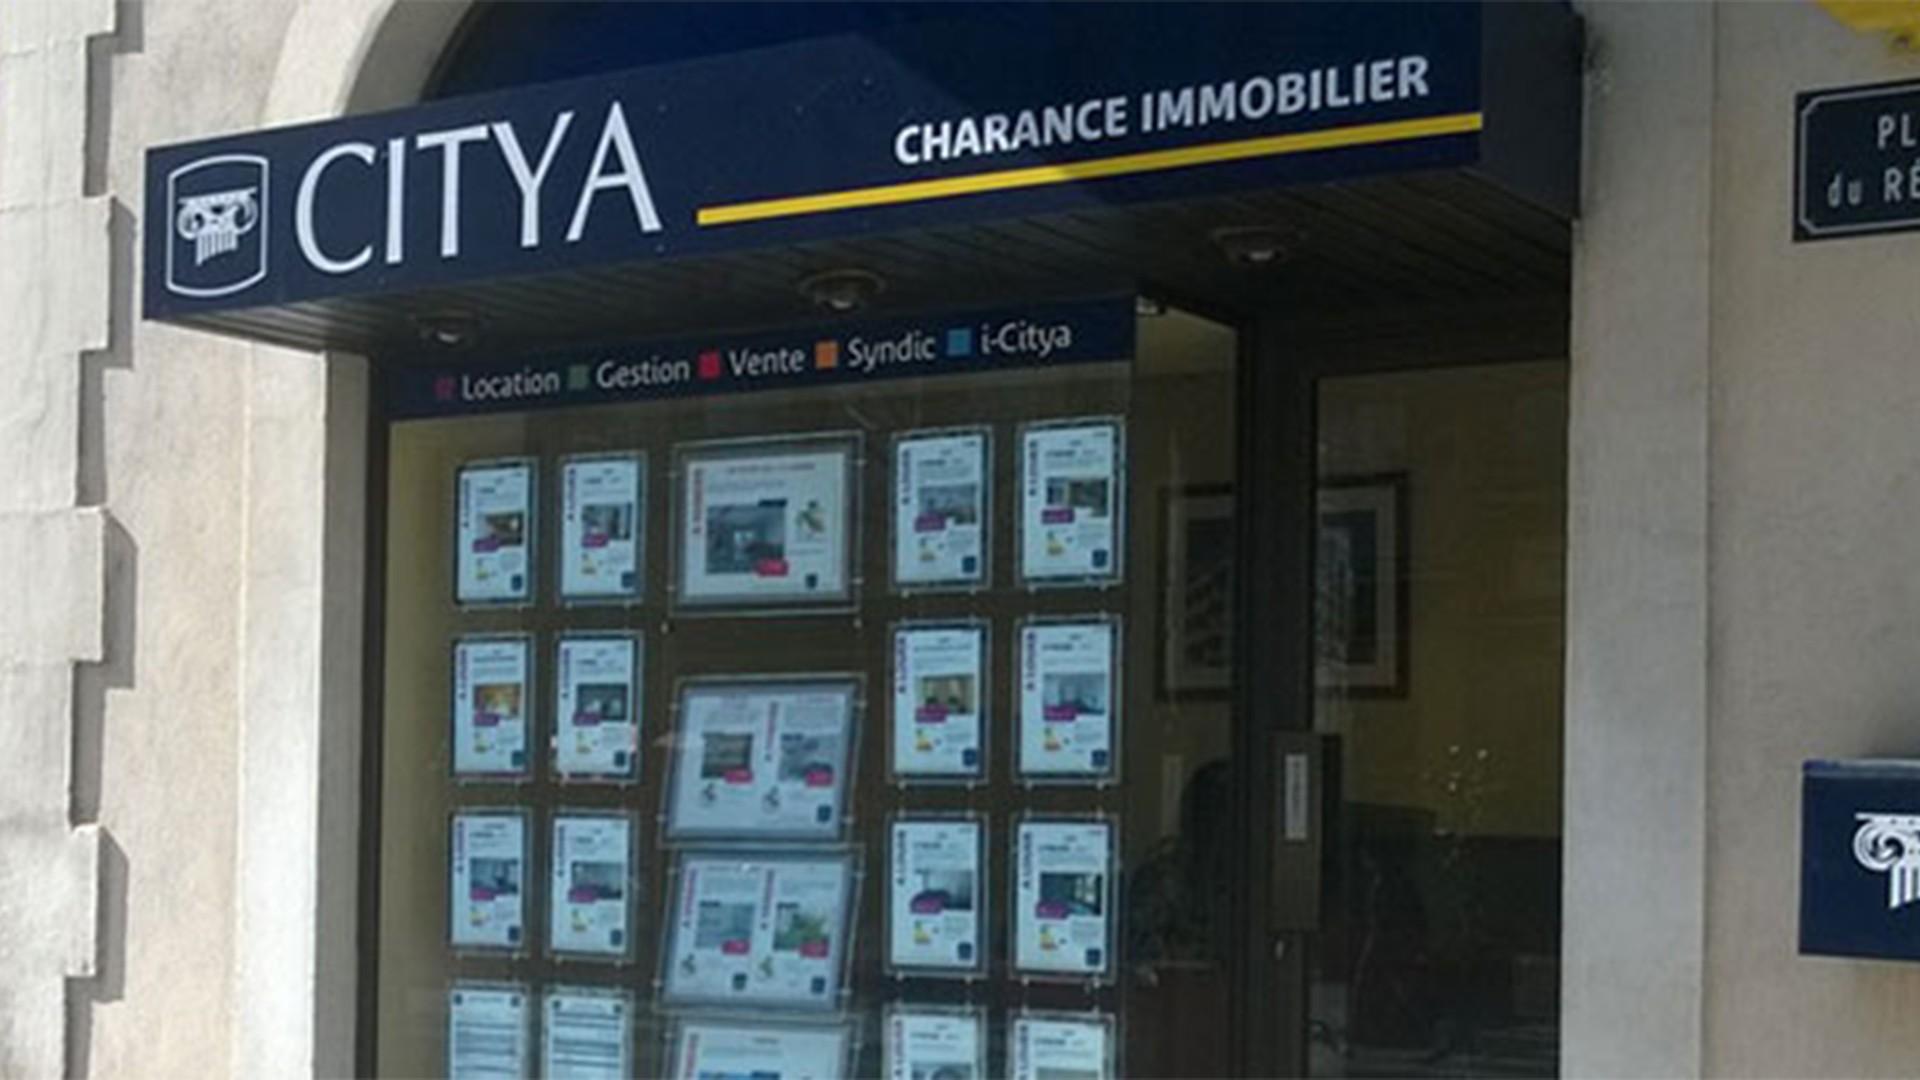 Agence immo Citya Charance